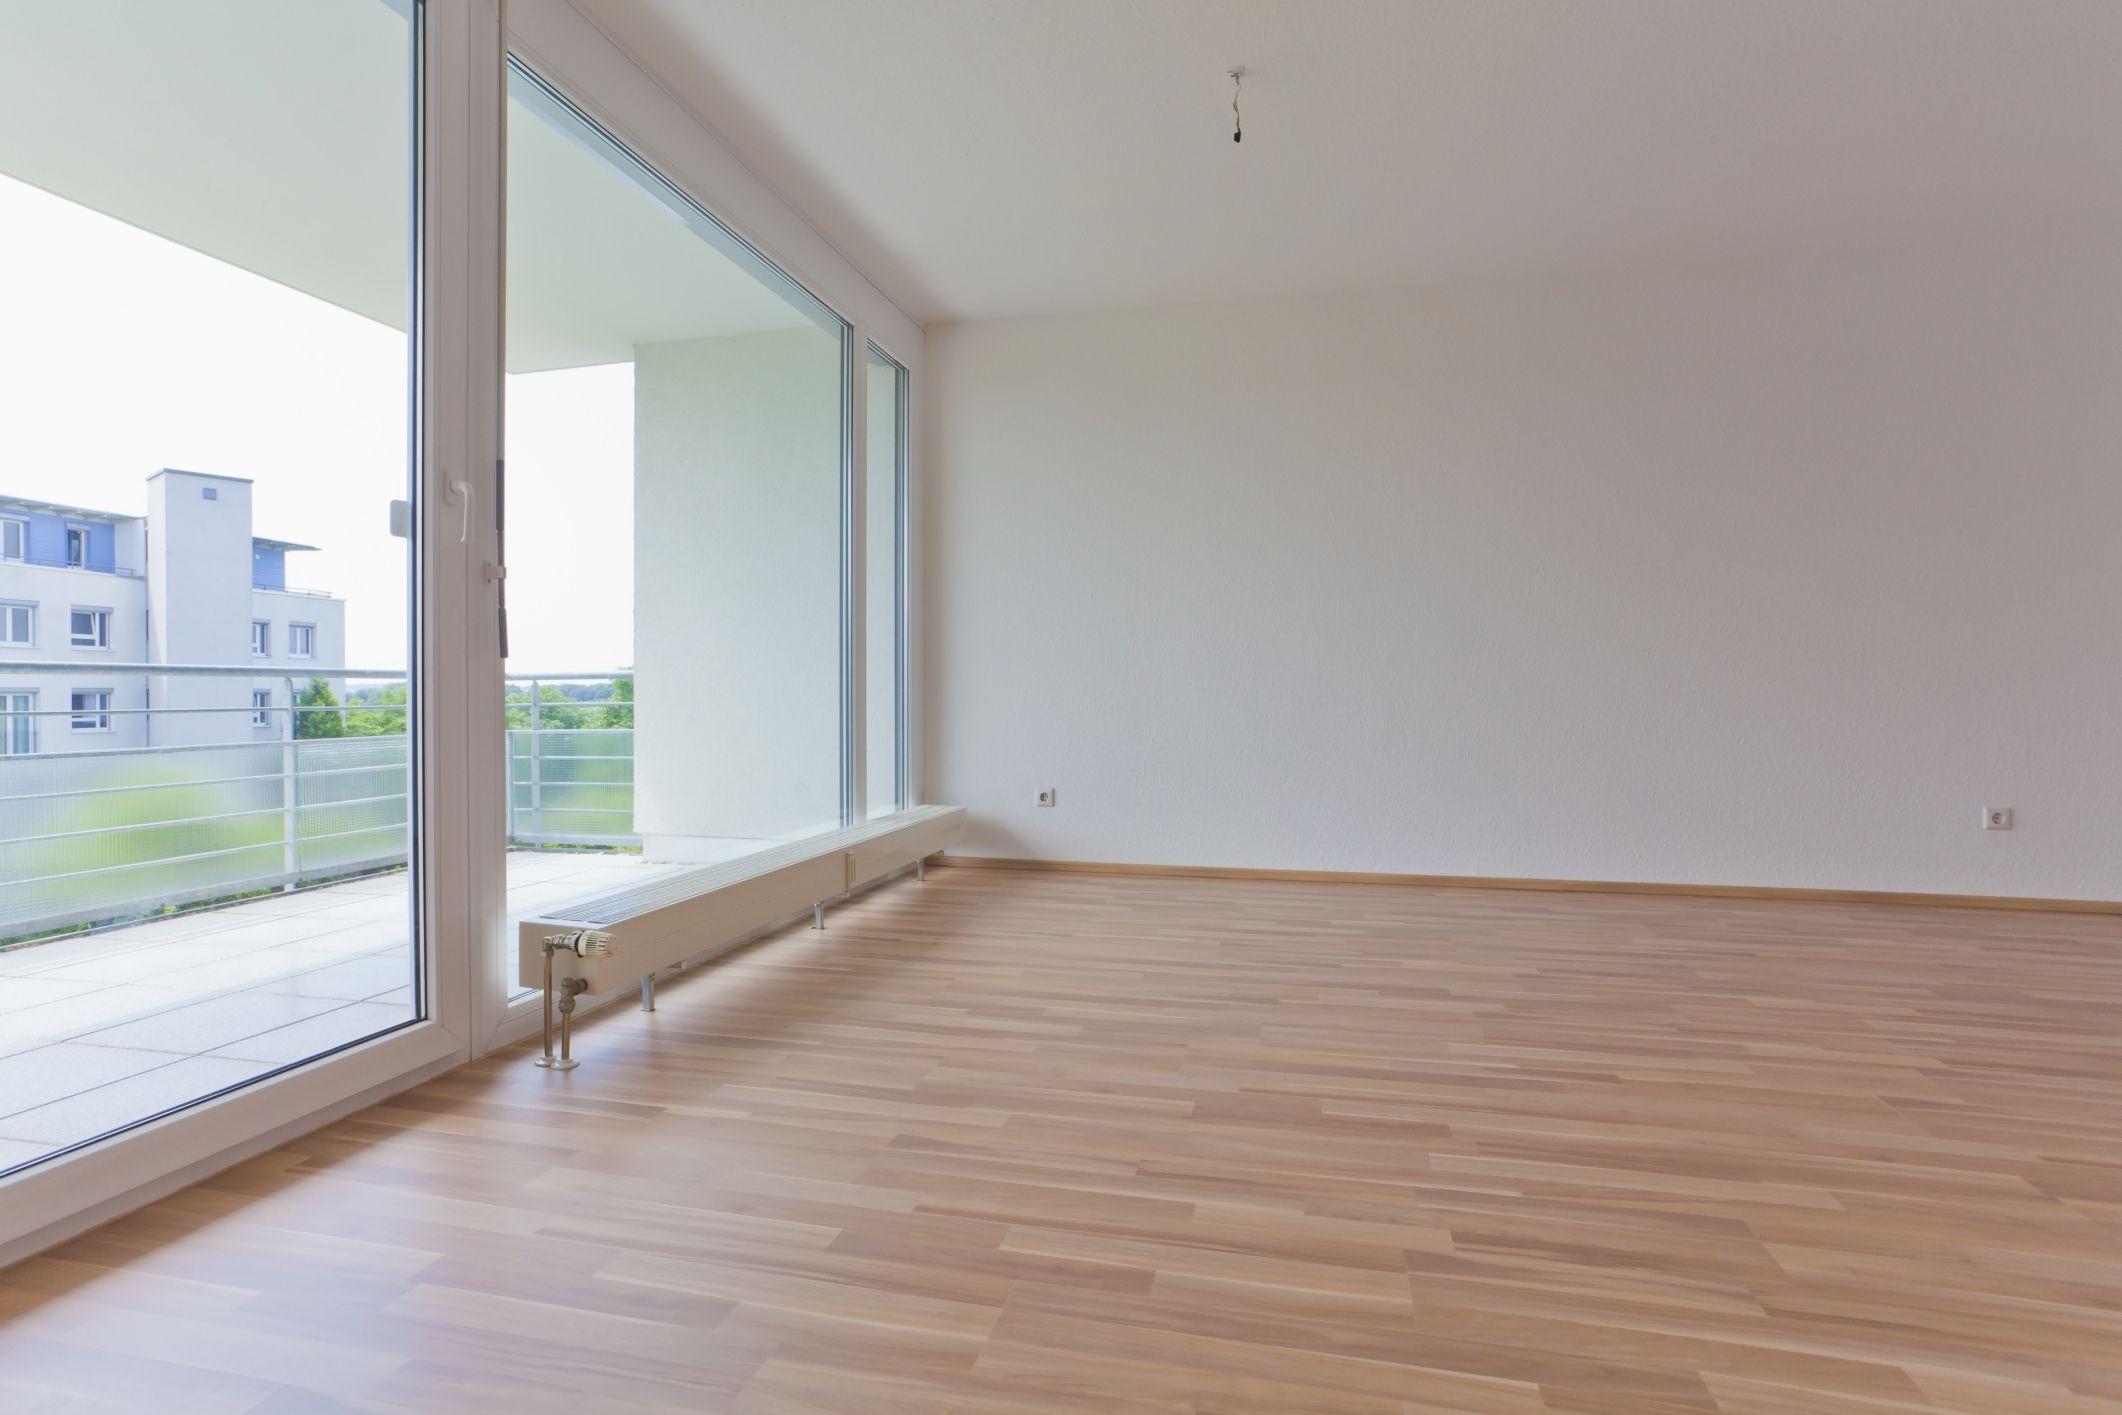 hardwood floor edge trim of its easy and fast to install plank vinyl flooring inside plank vinyl flooring 155786902 56a4a0553df78cf7728350af